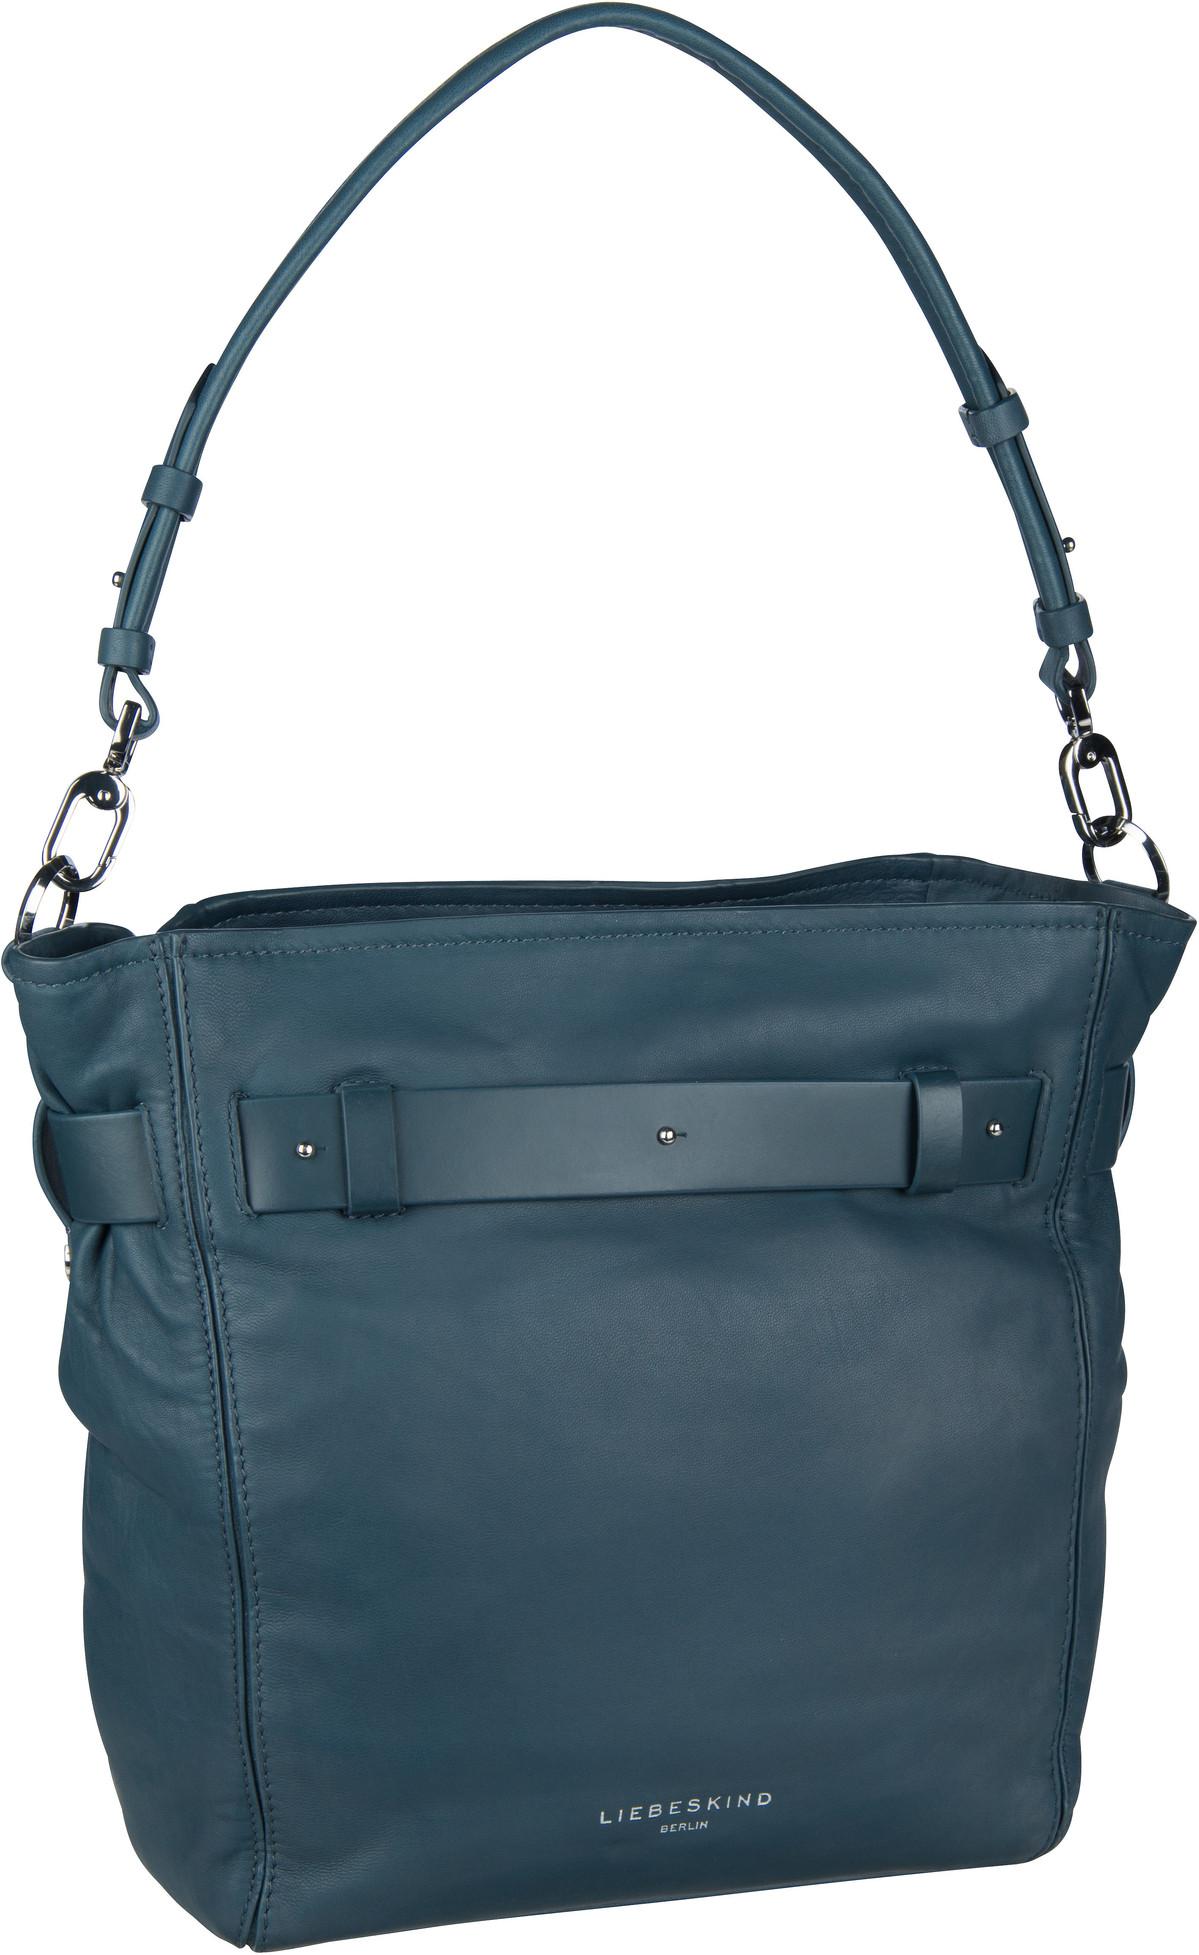 Berlin Handtasche Soft Bucket Hobo M China Blue